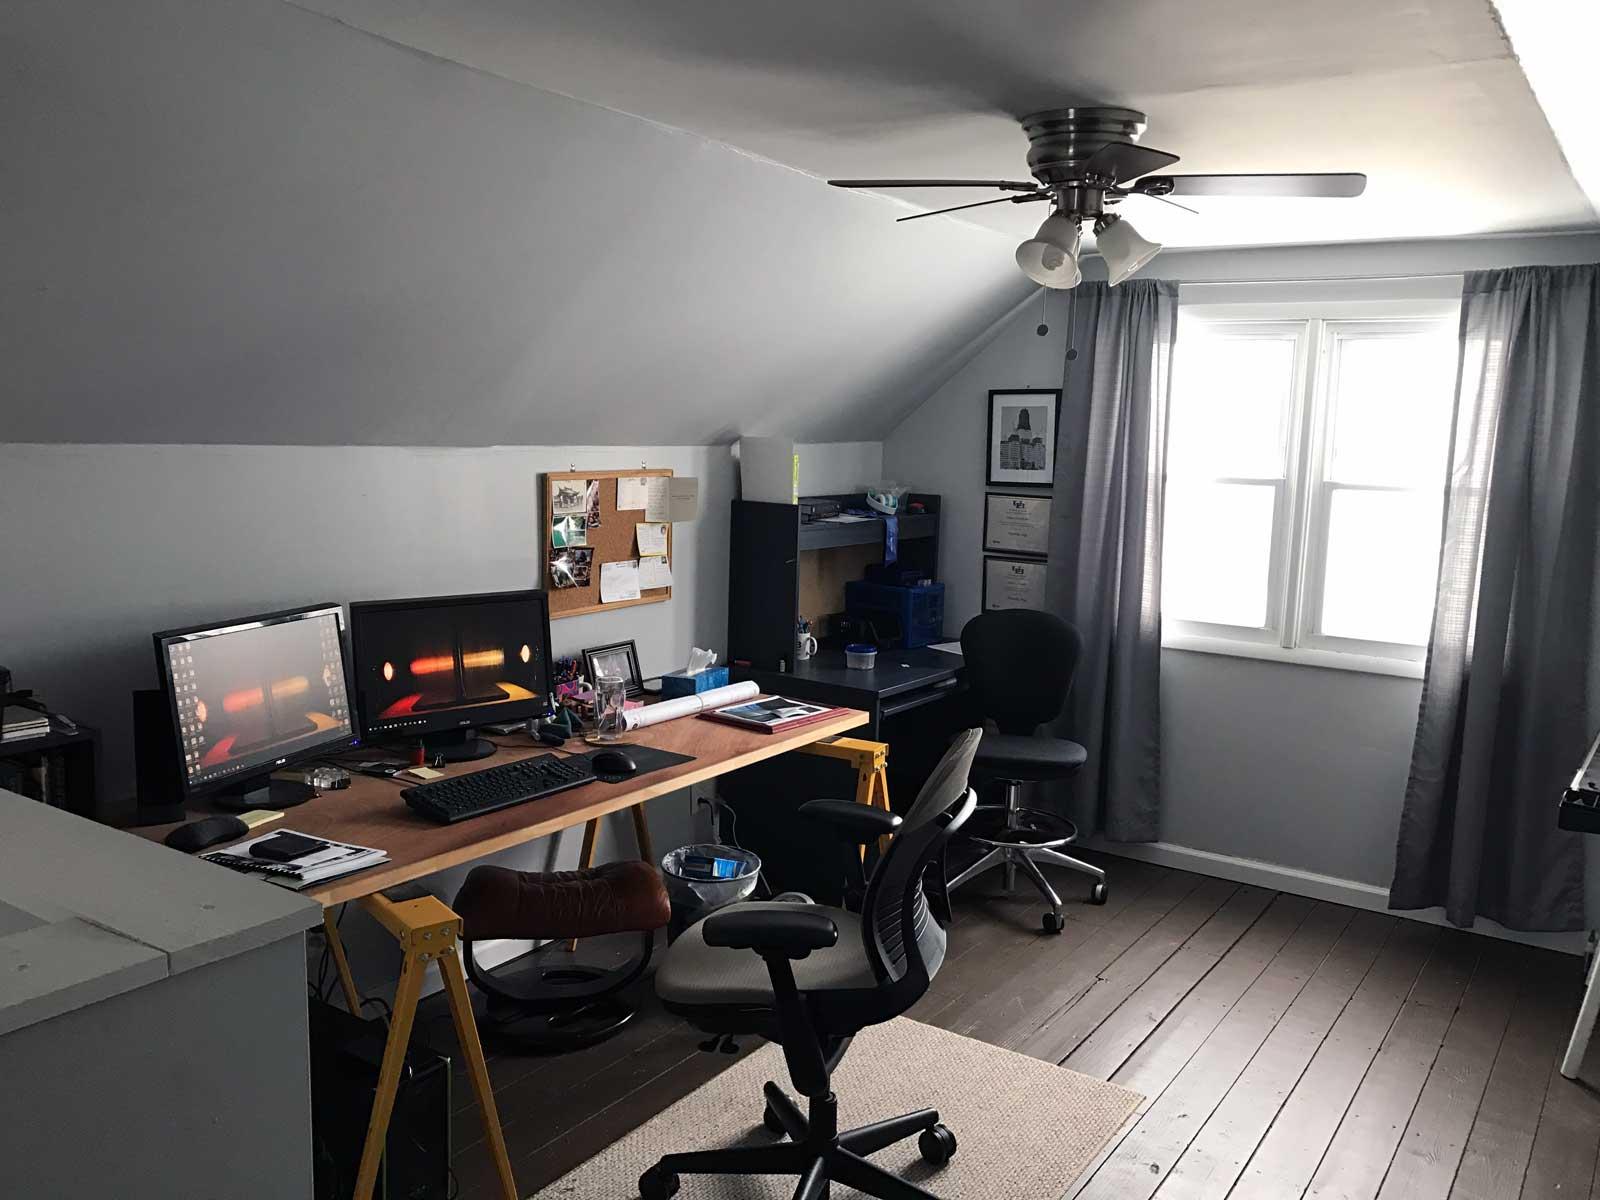 Home Renovation - Attic Studio